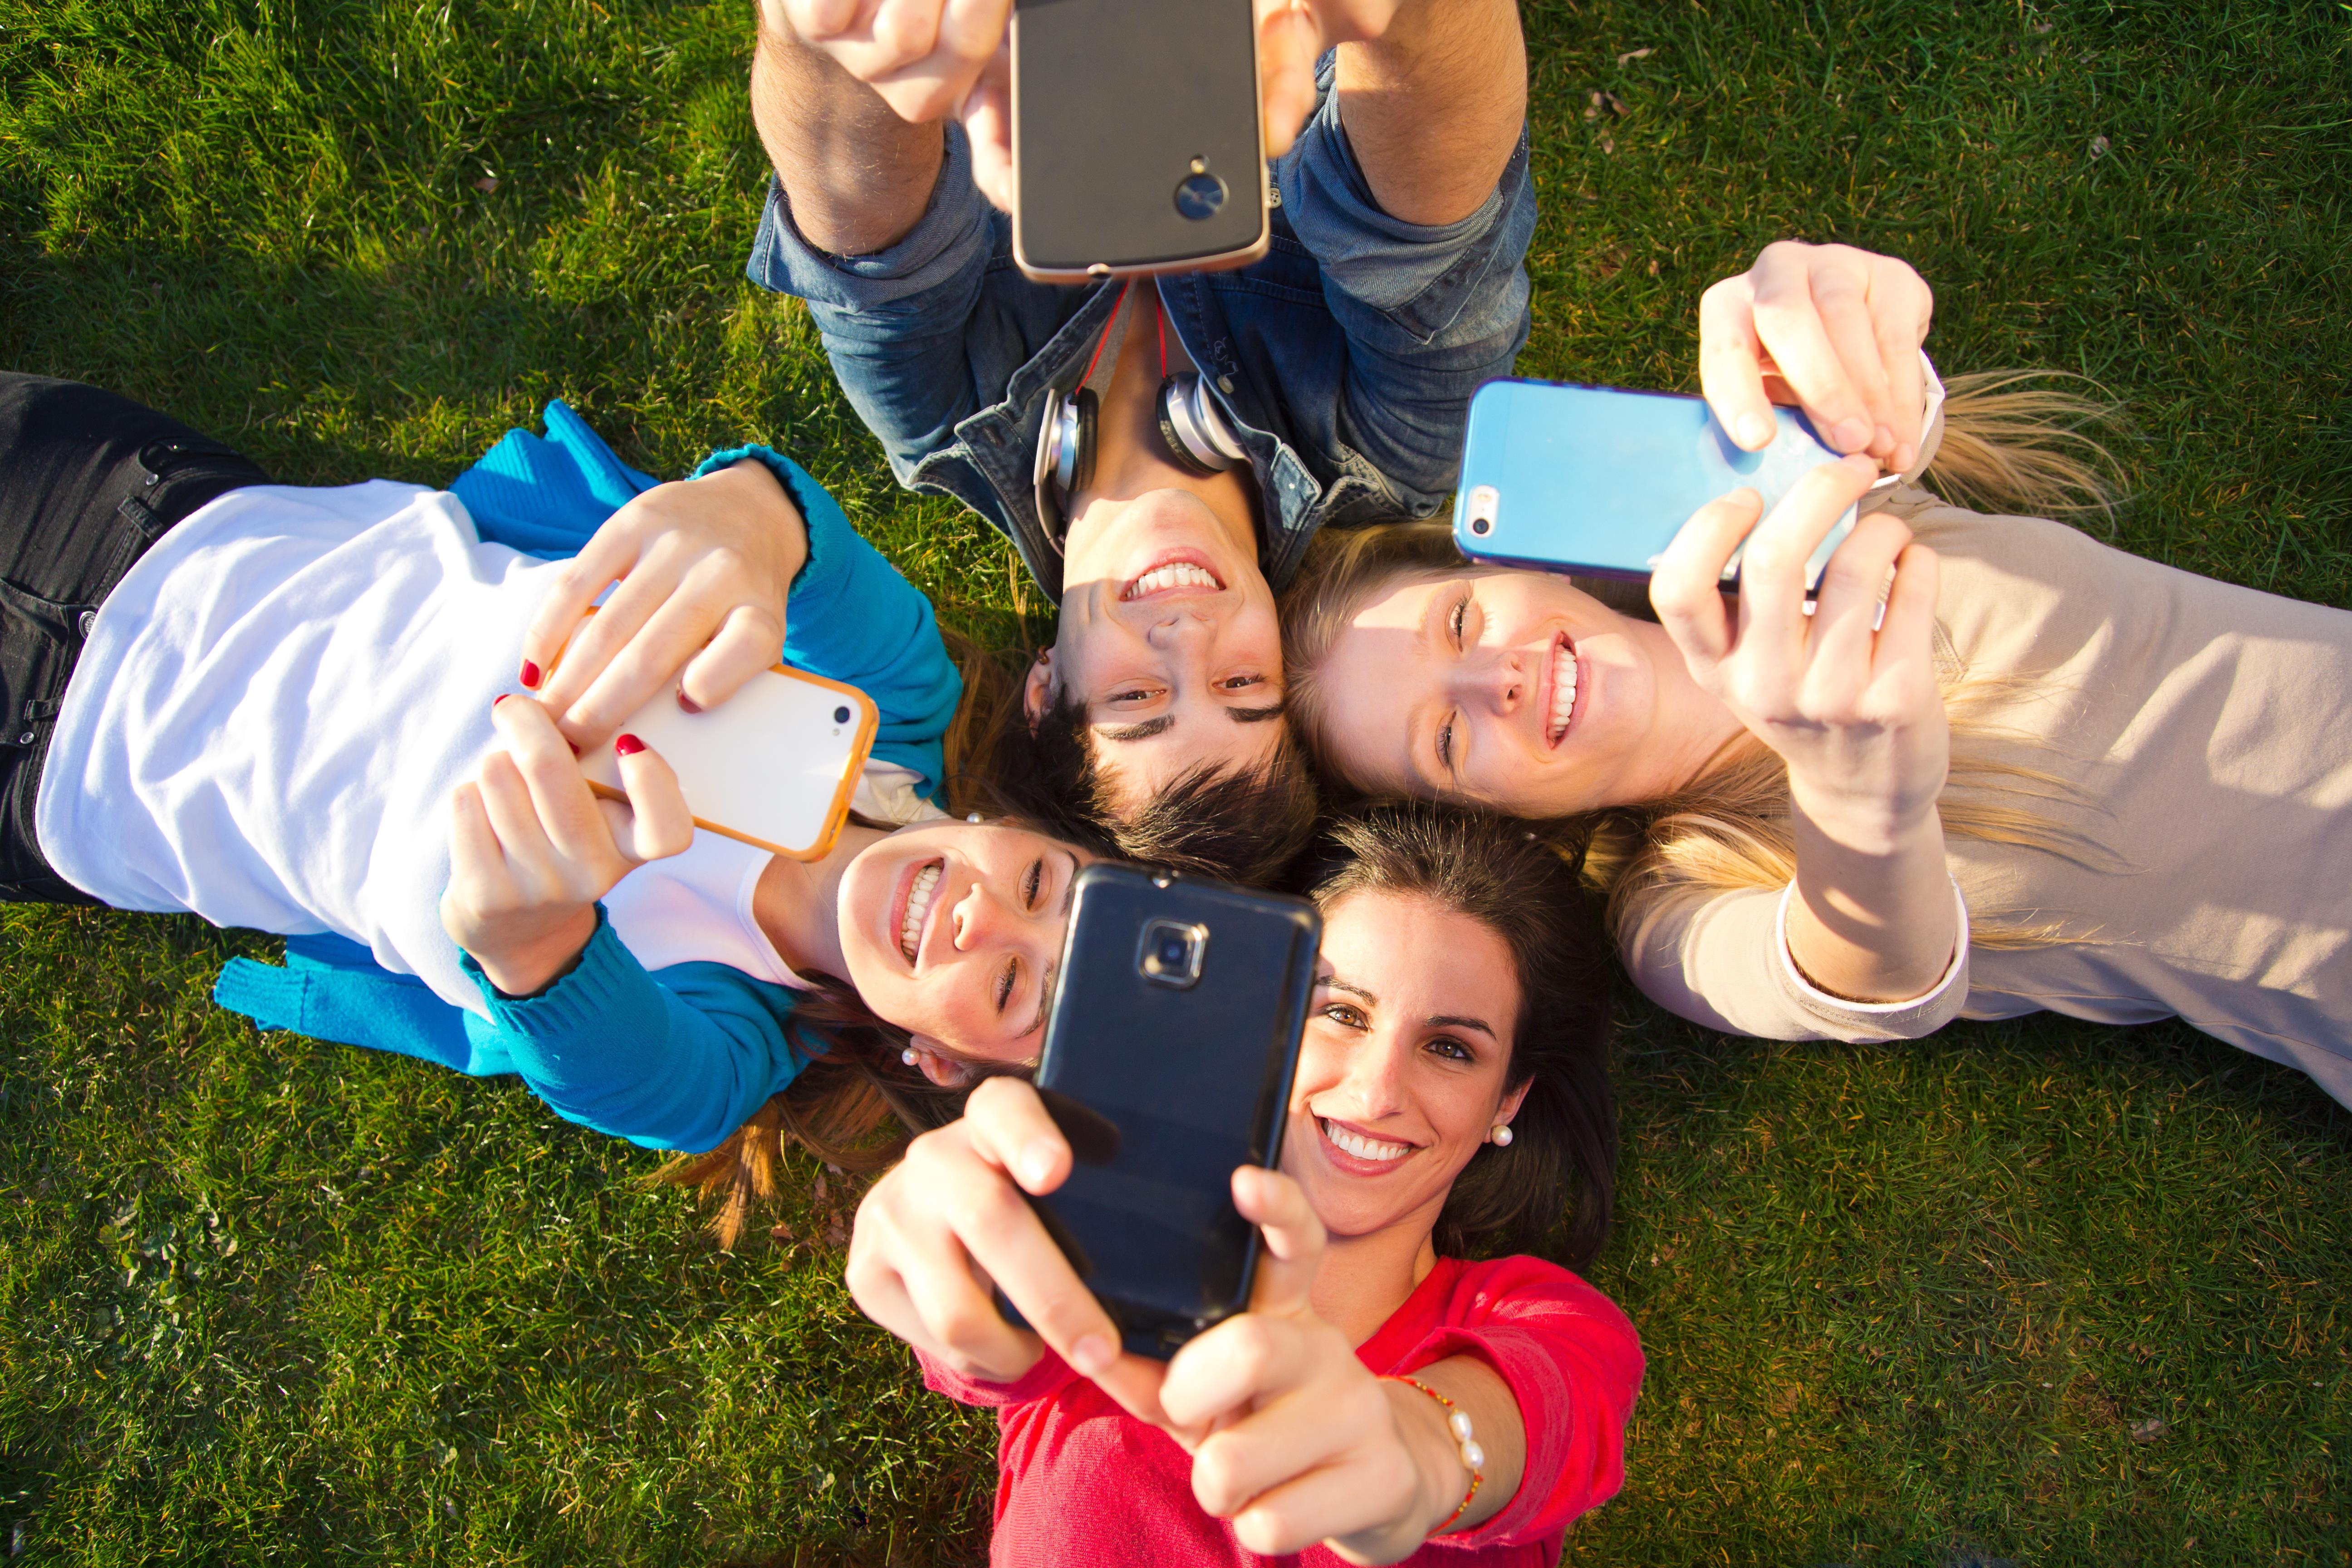 Teenagers on phones ()